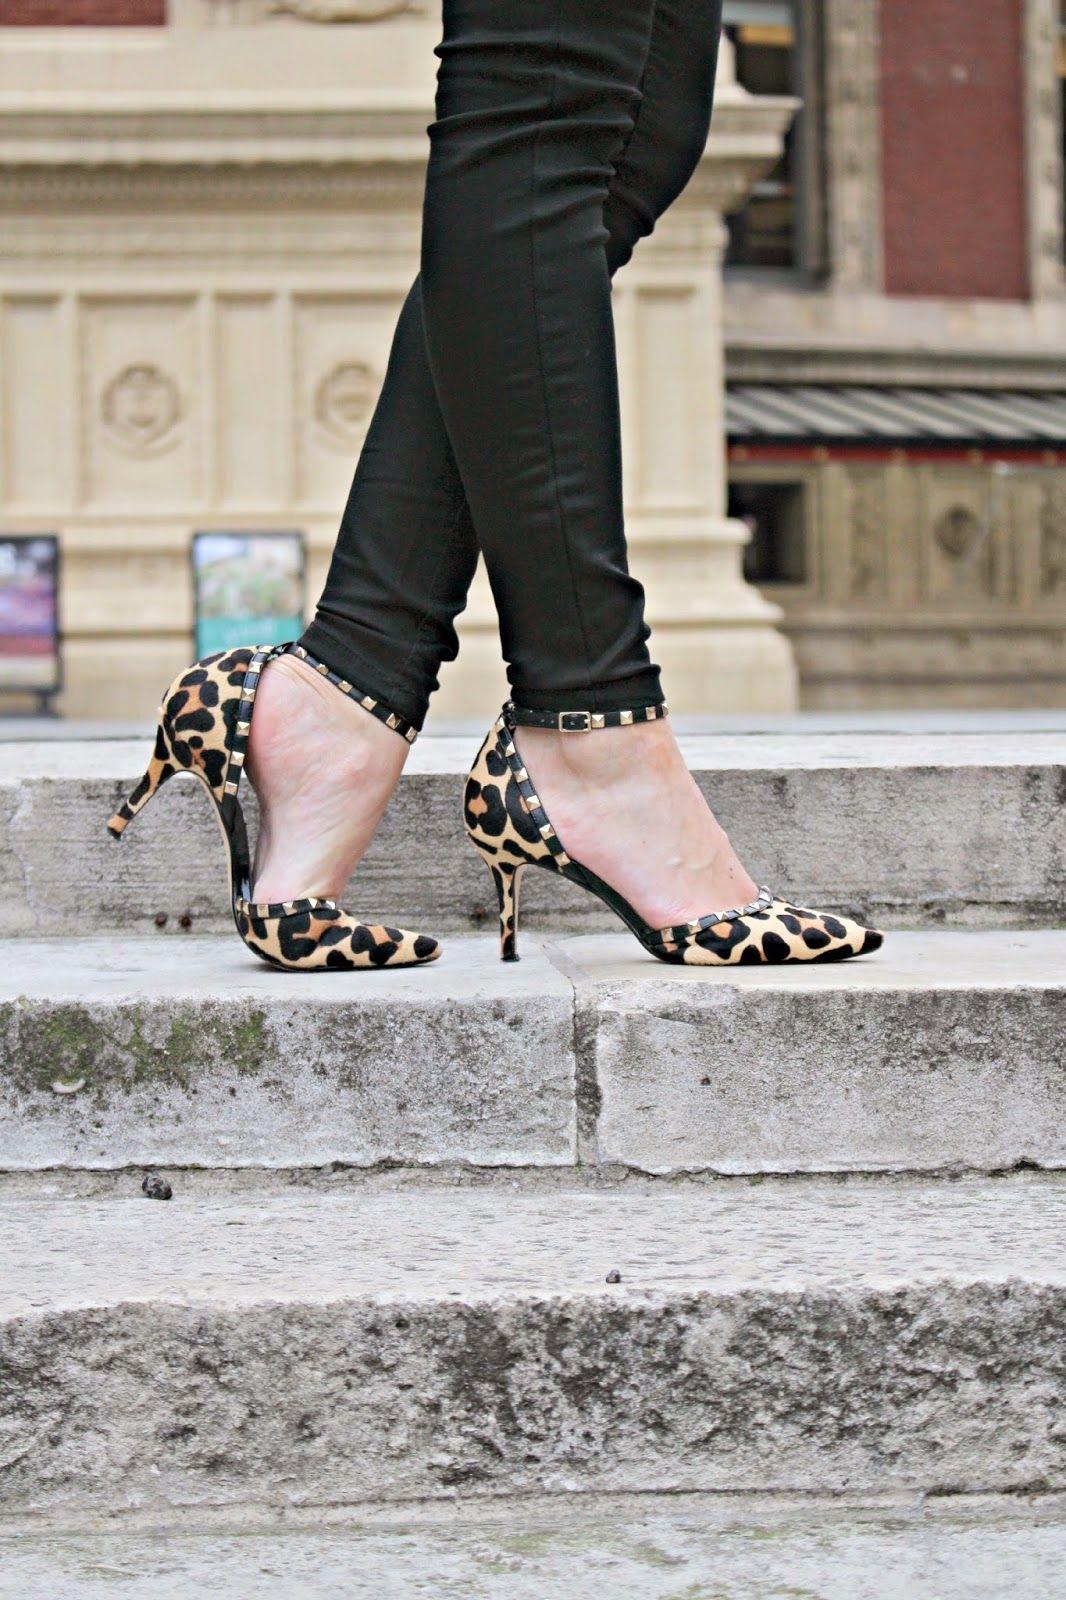 Roller shoes london - 3 Ways To Wear Black Skinny Jeans 2